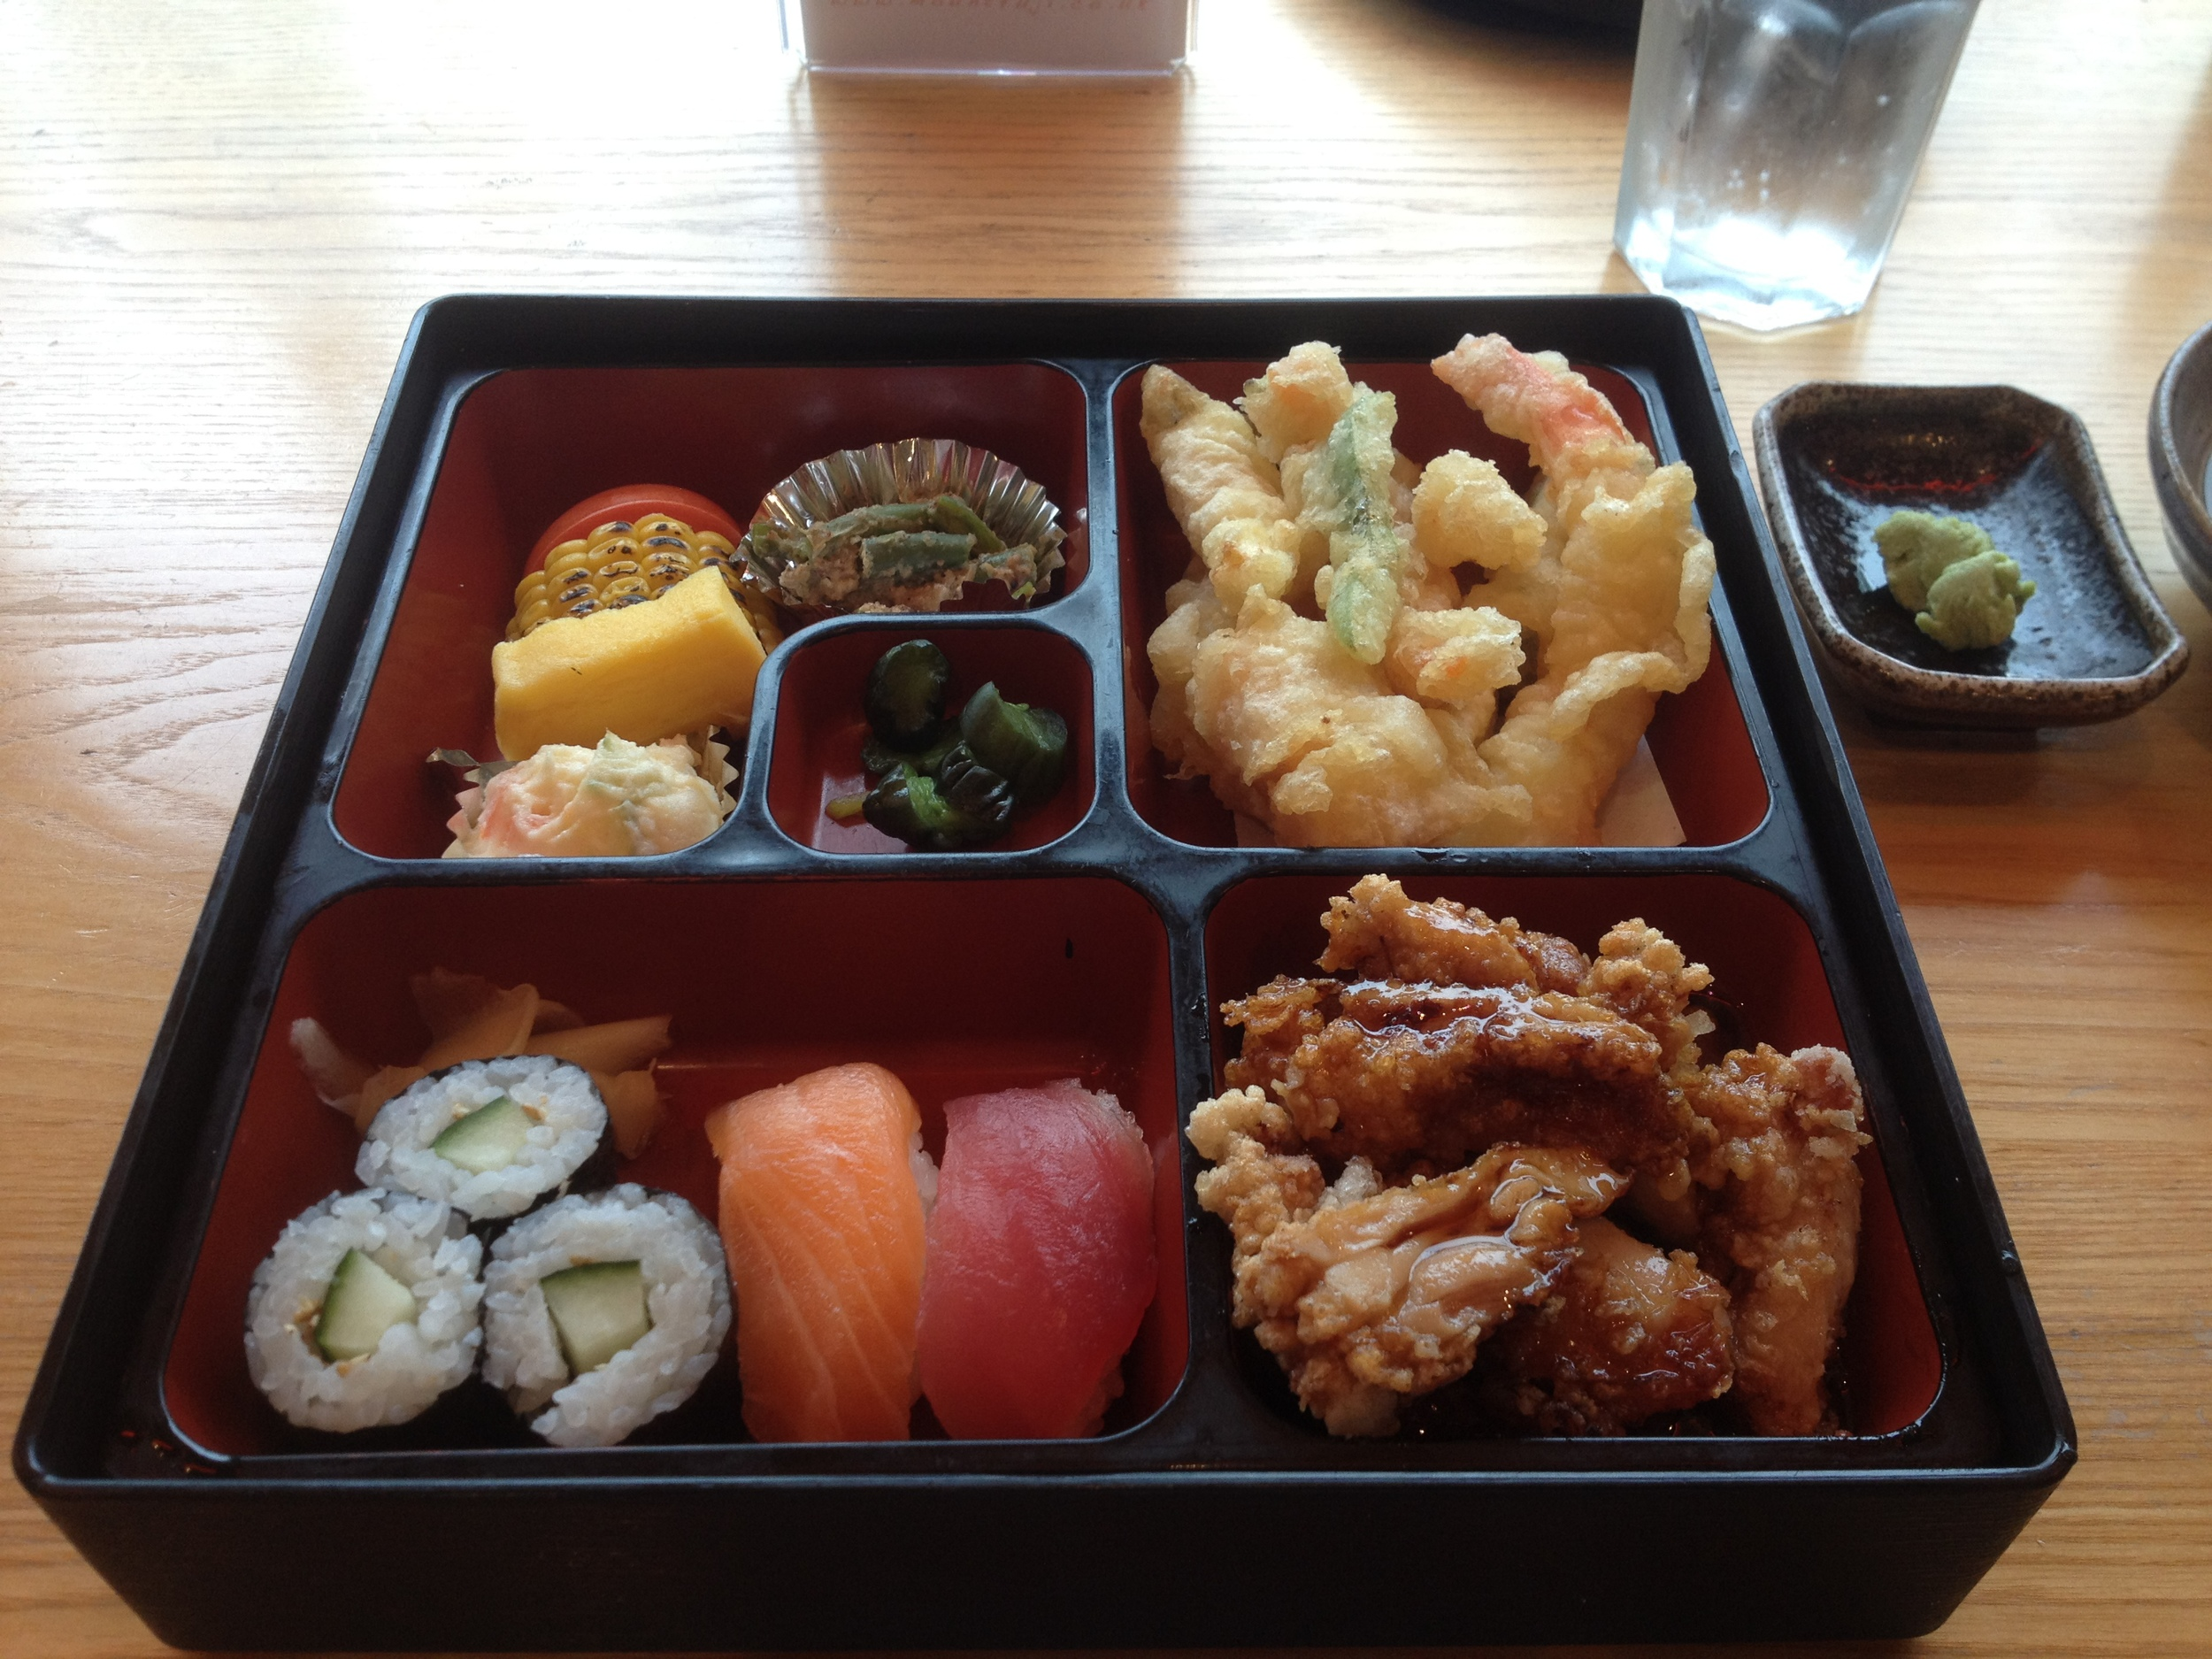 Bento box at Mount Fuji restaurant, Birmingham